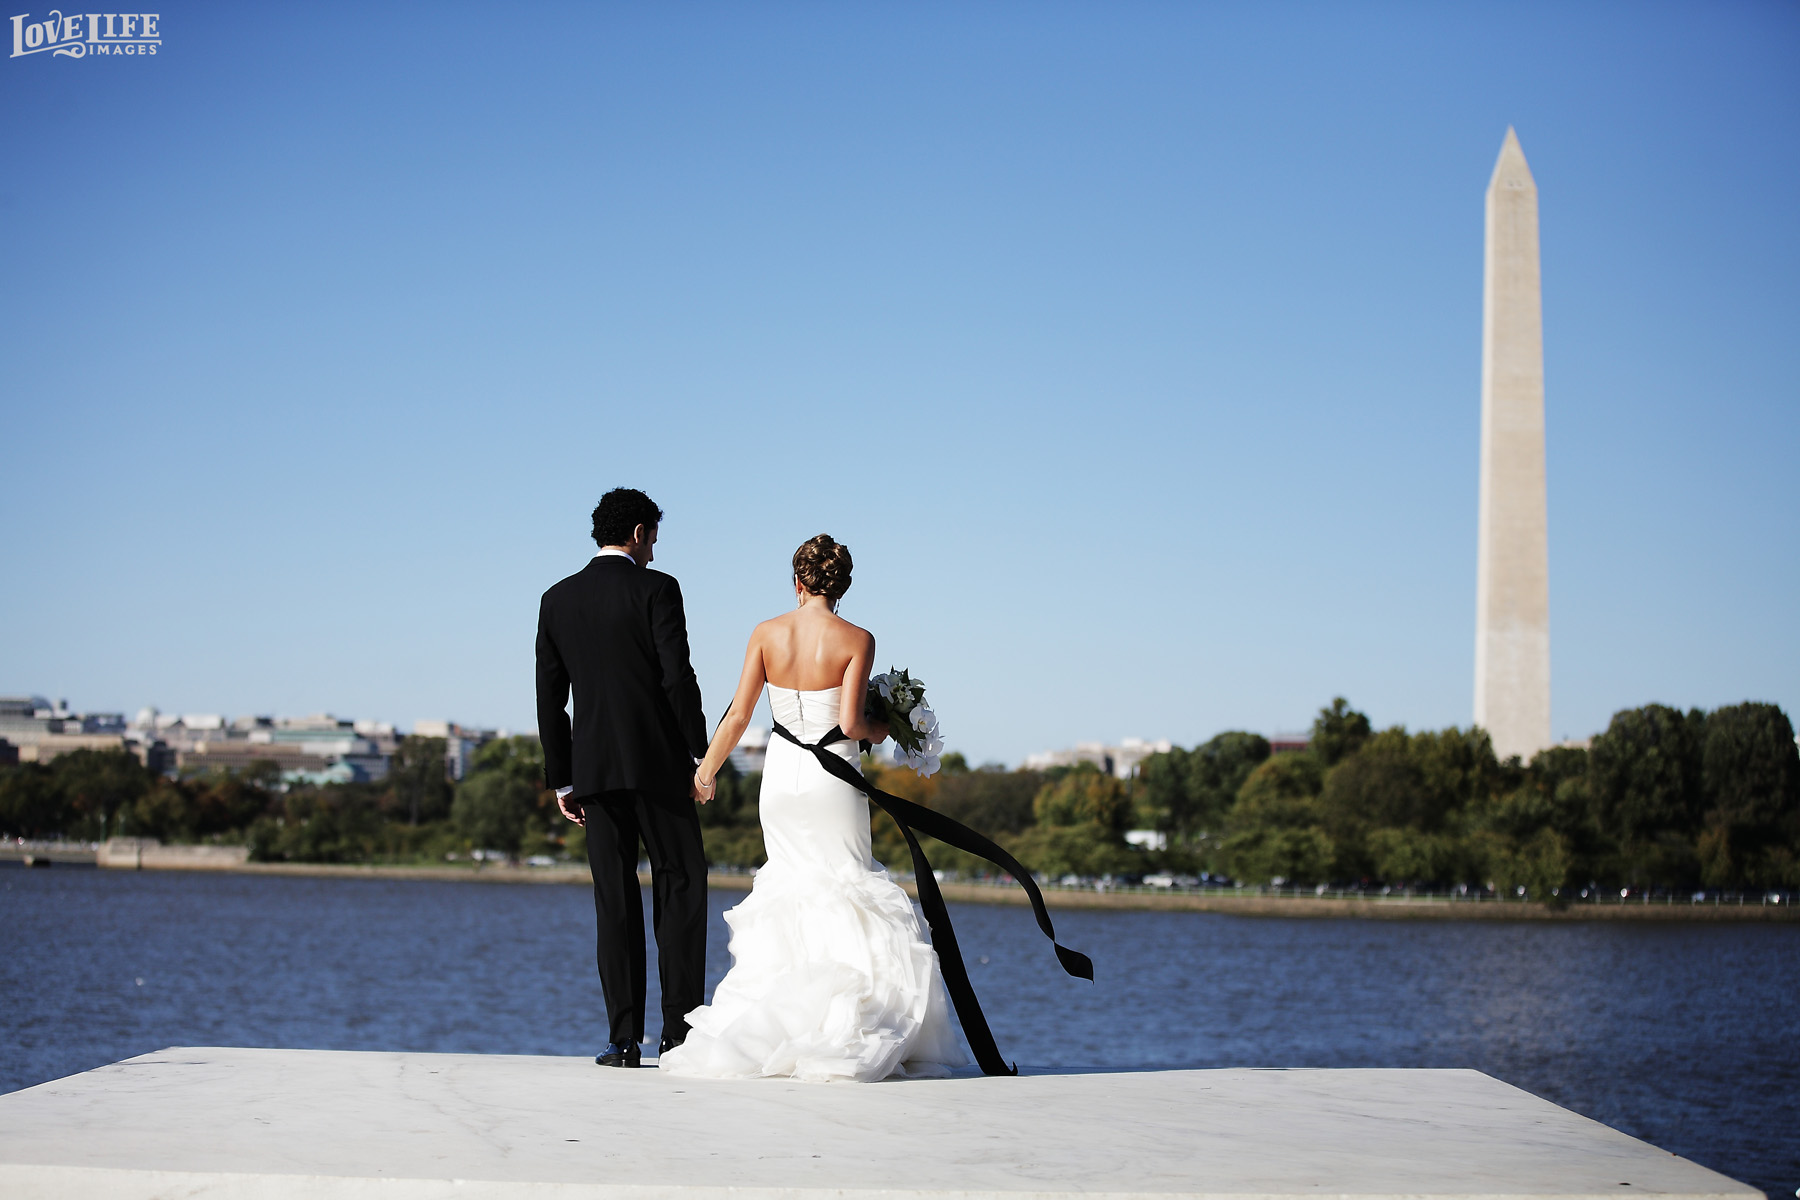 Washington DC and Baltimore Wedding Photographer Love Life Images _Elisha_Maria0056.JPG